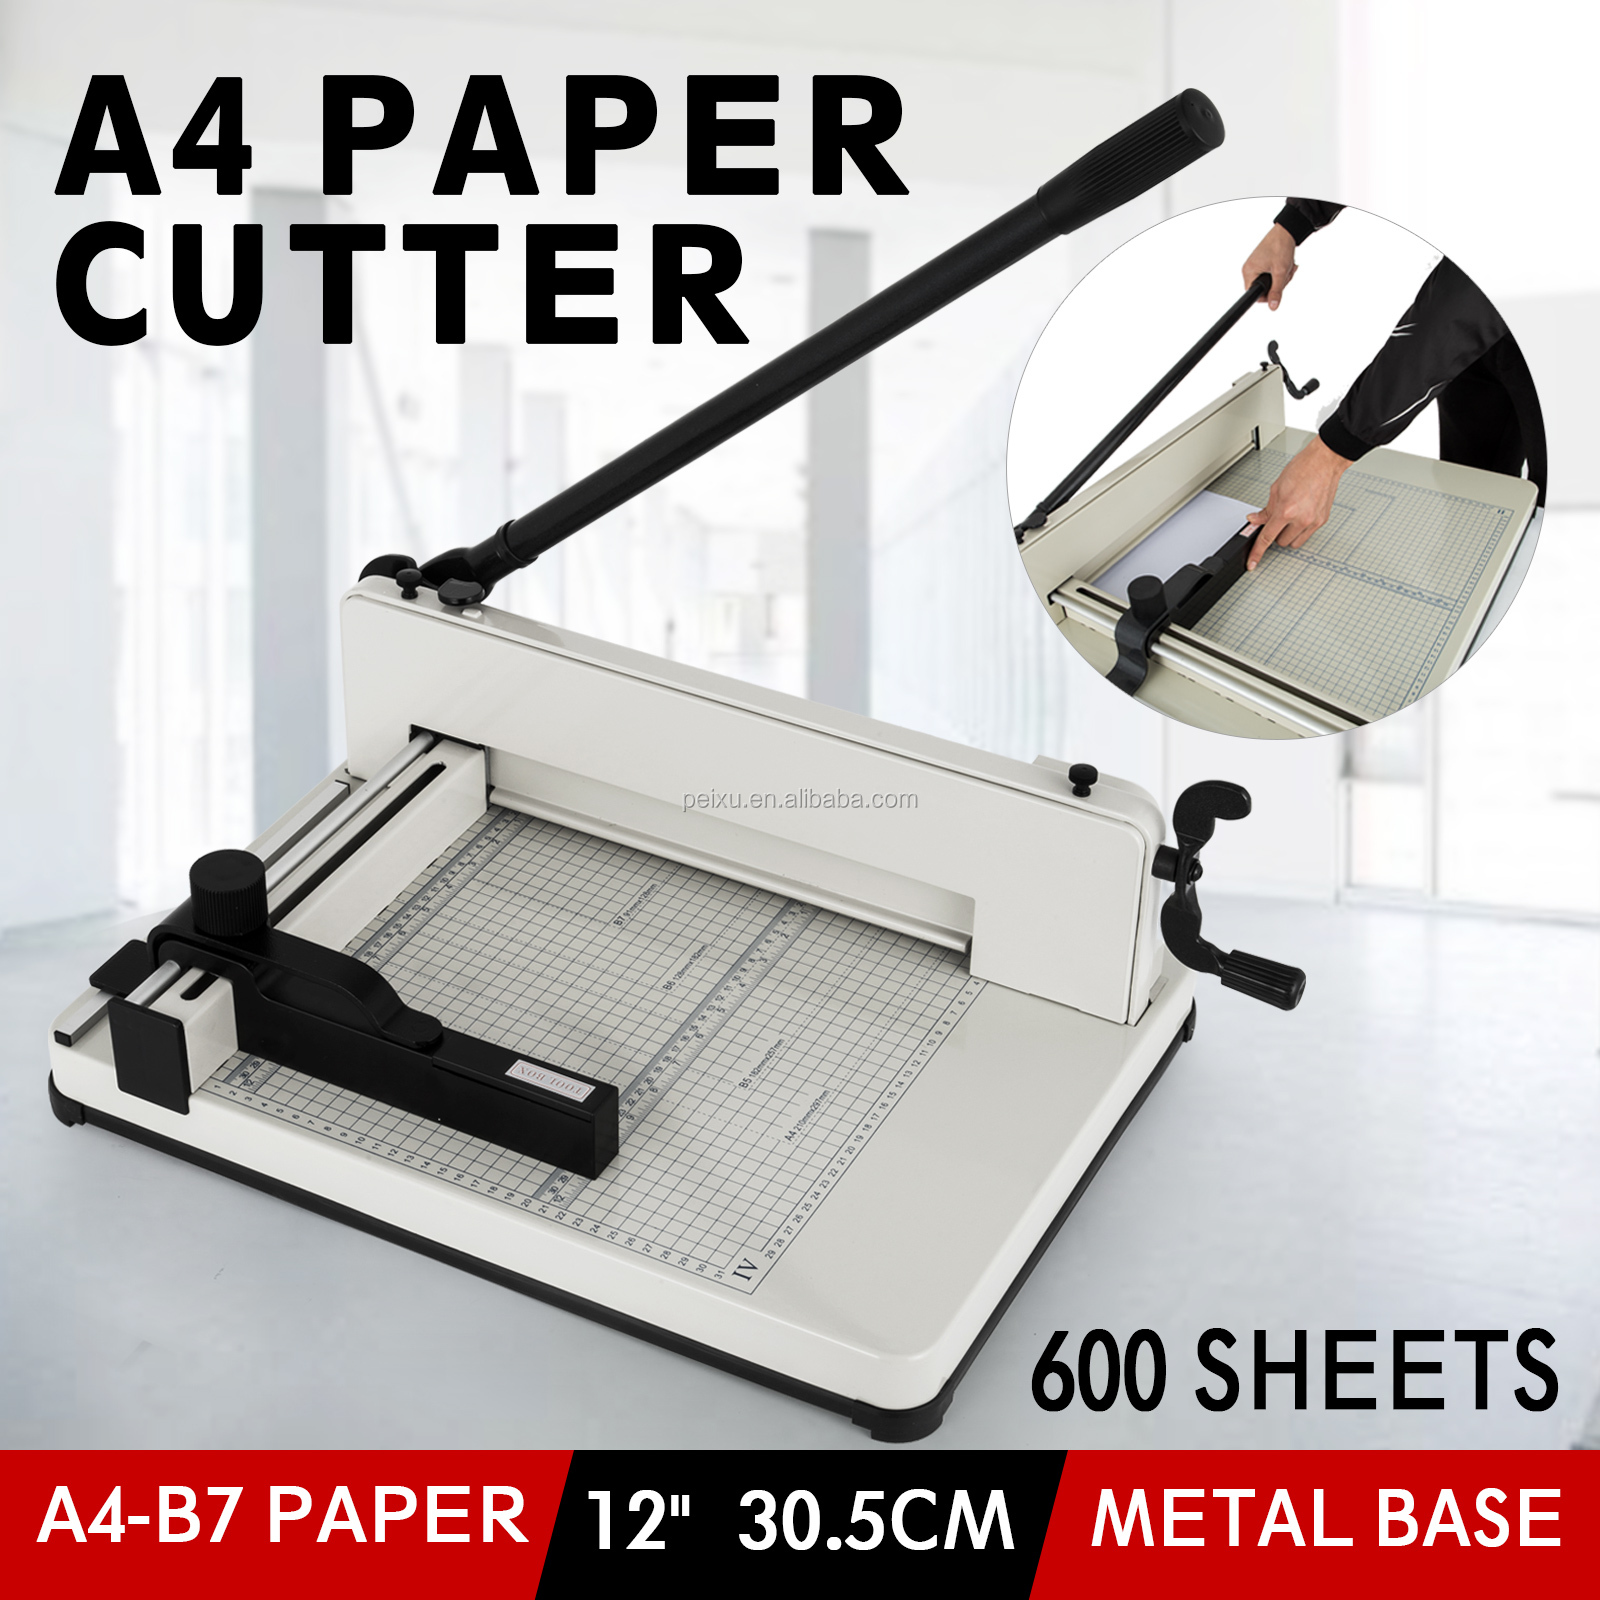 A4 Guillotine Cutter/Mesin Pemotong Kertas Harga dan Cutter Kertas Mati Mesin Pemotong Kertas